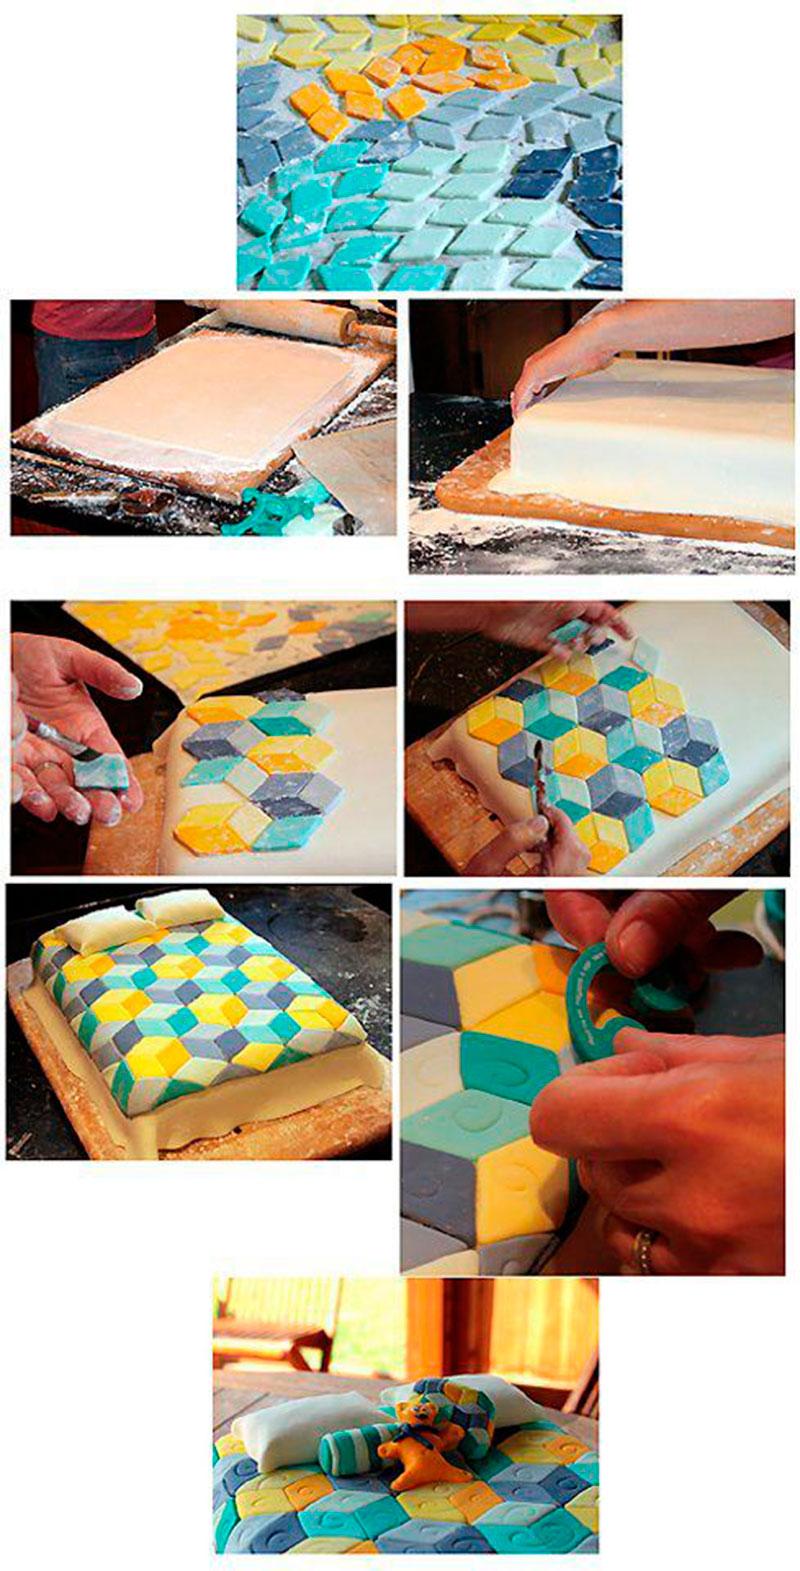 Montar bolo infantil 32